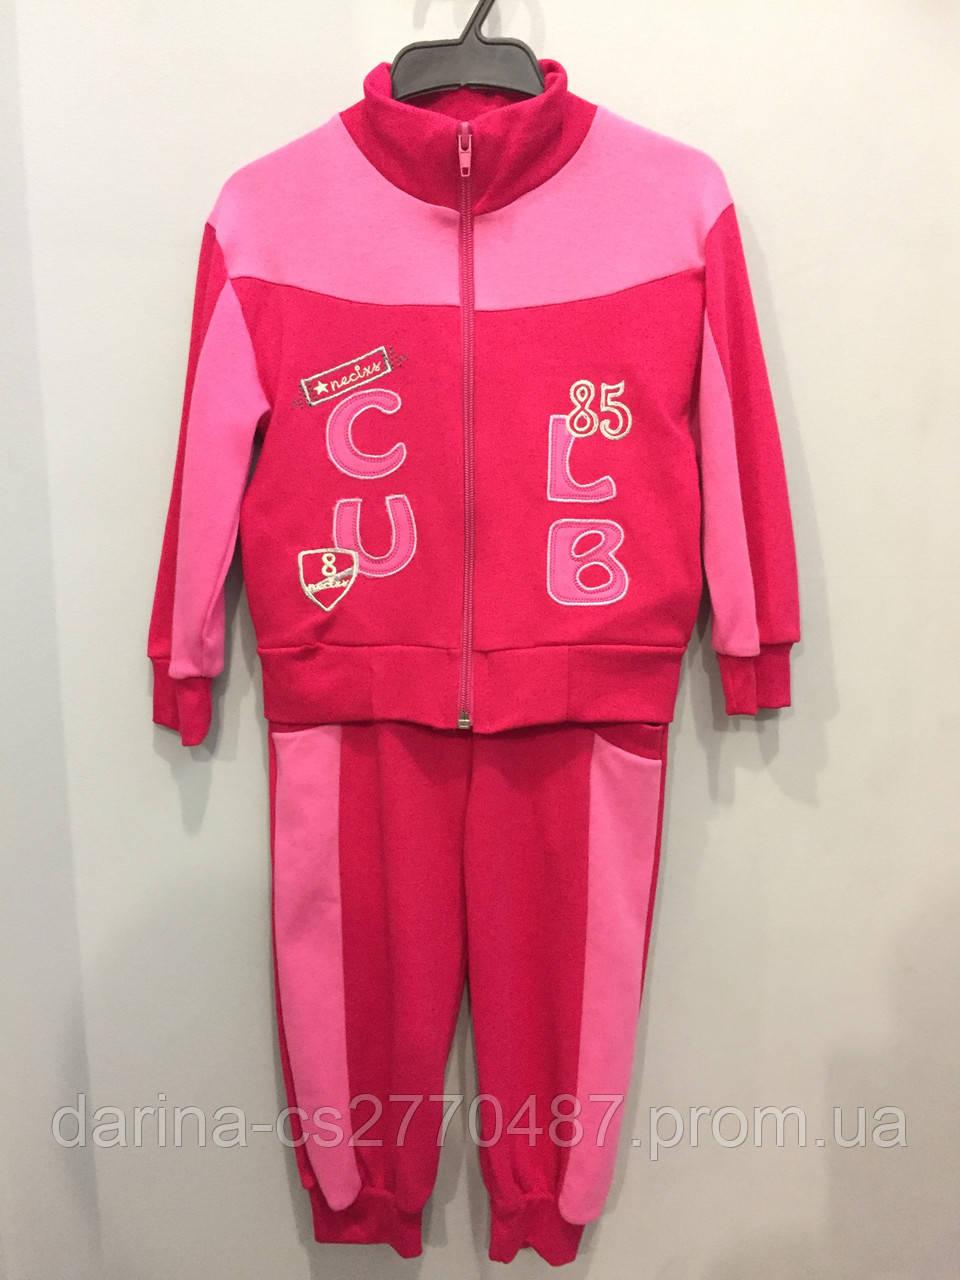 Спортивный костюм для девочки р52, 56, 60